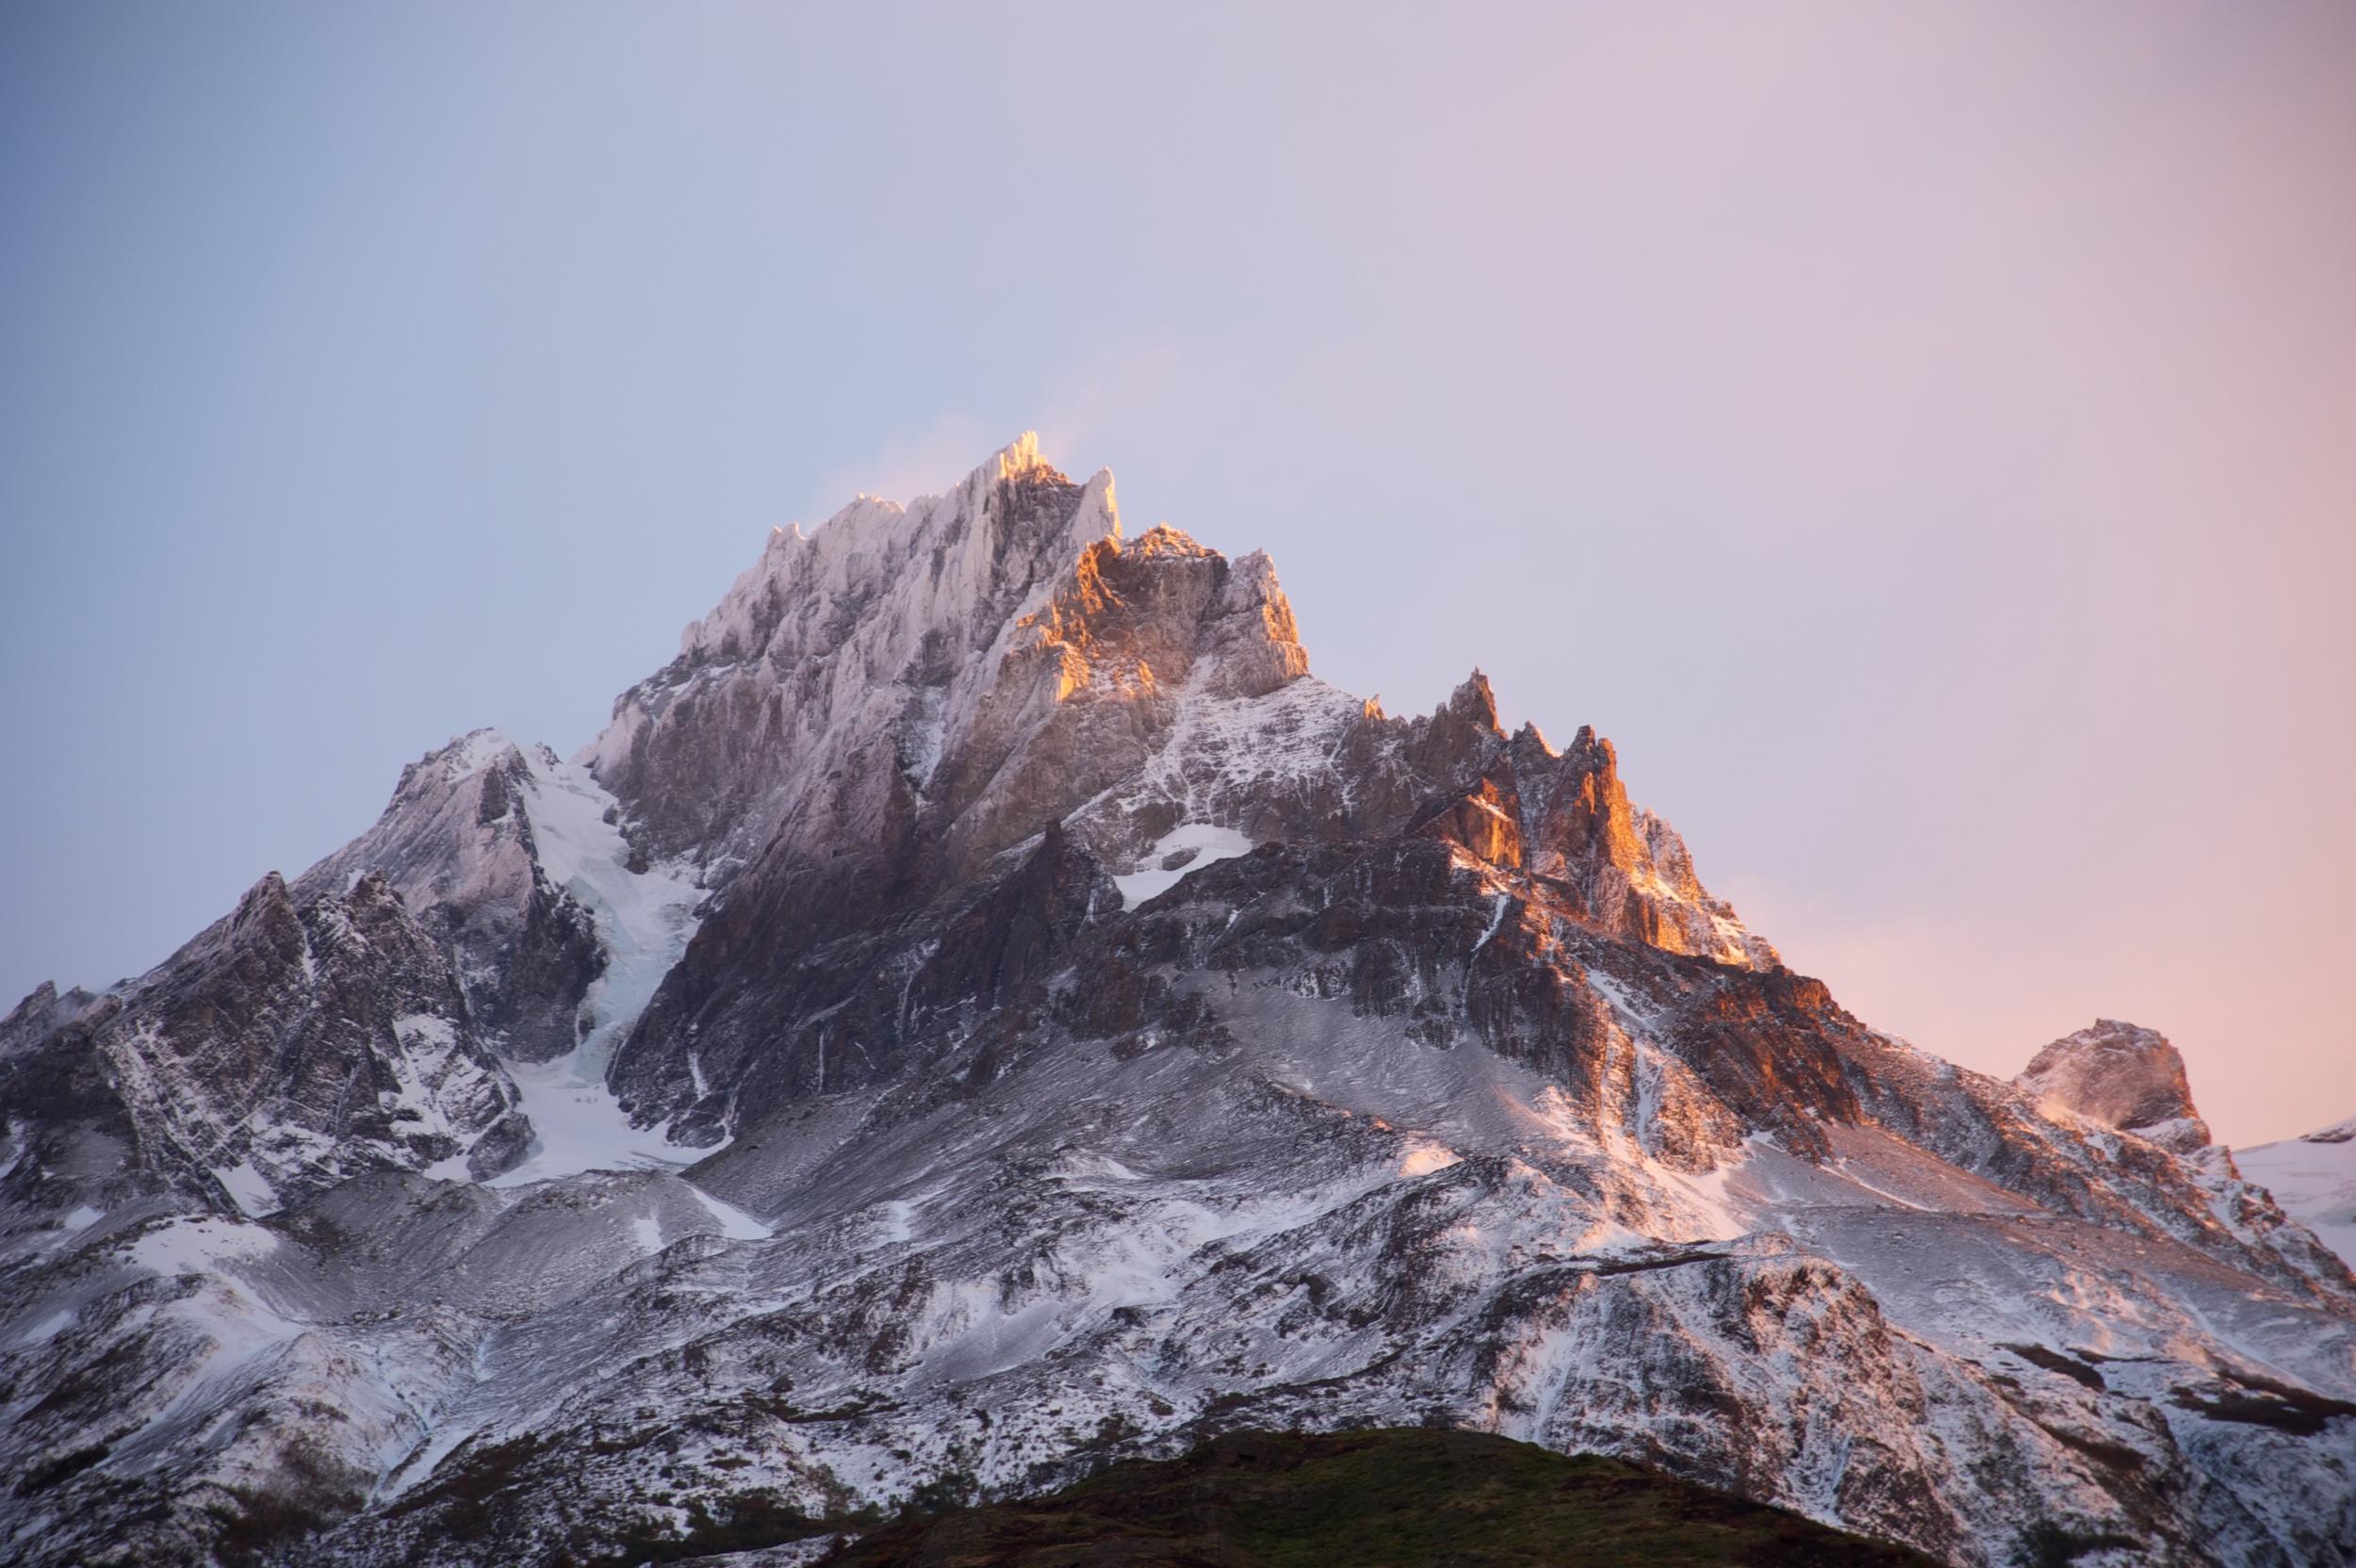 Sunrise #2 at Lago Pehoe, Torres del Paine, Patagonia, Chile, 6 Apr 2012